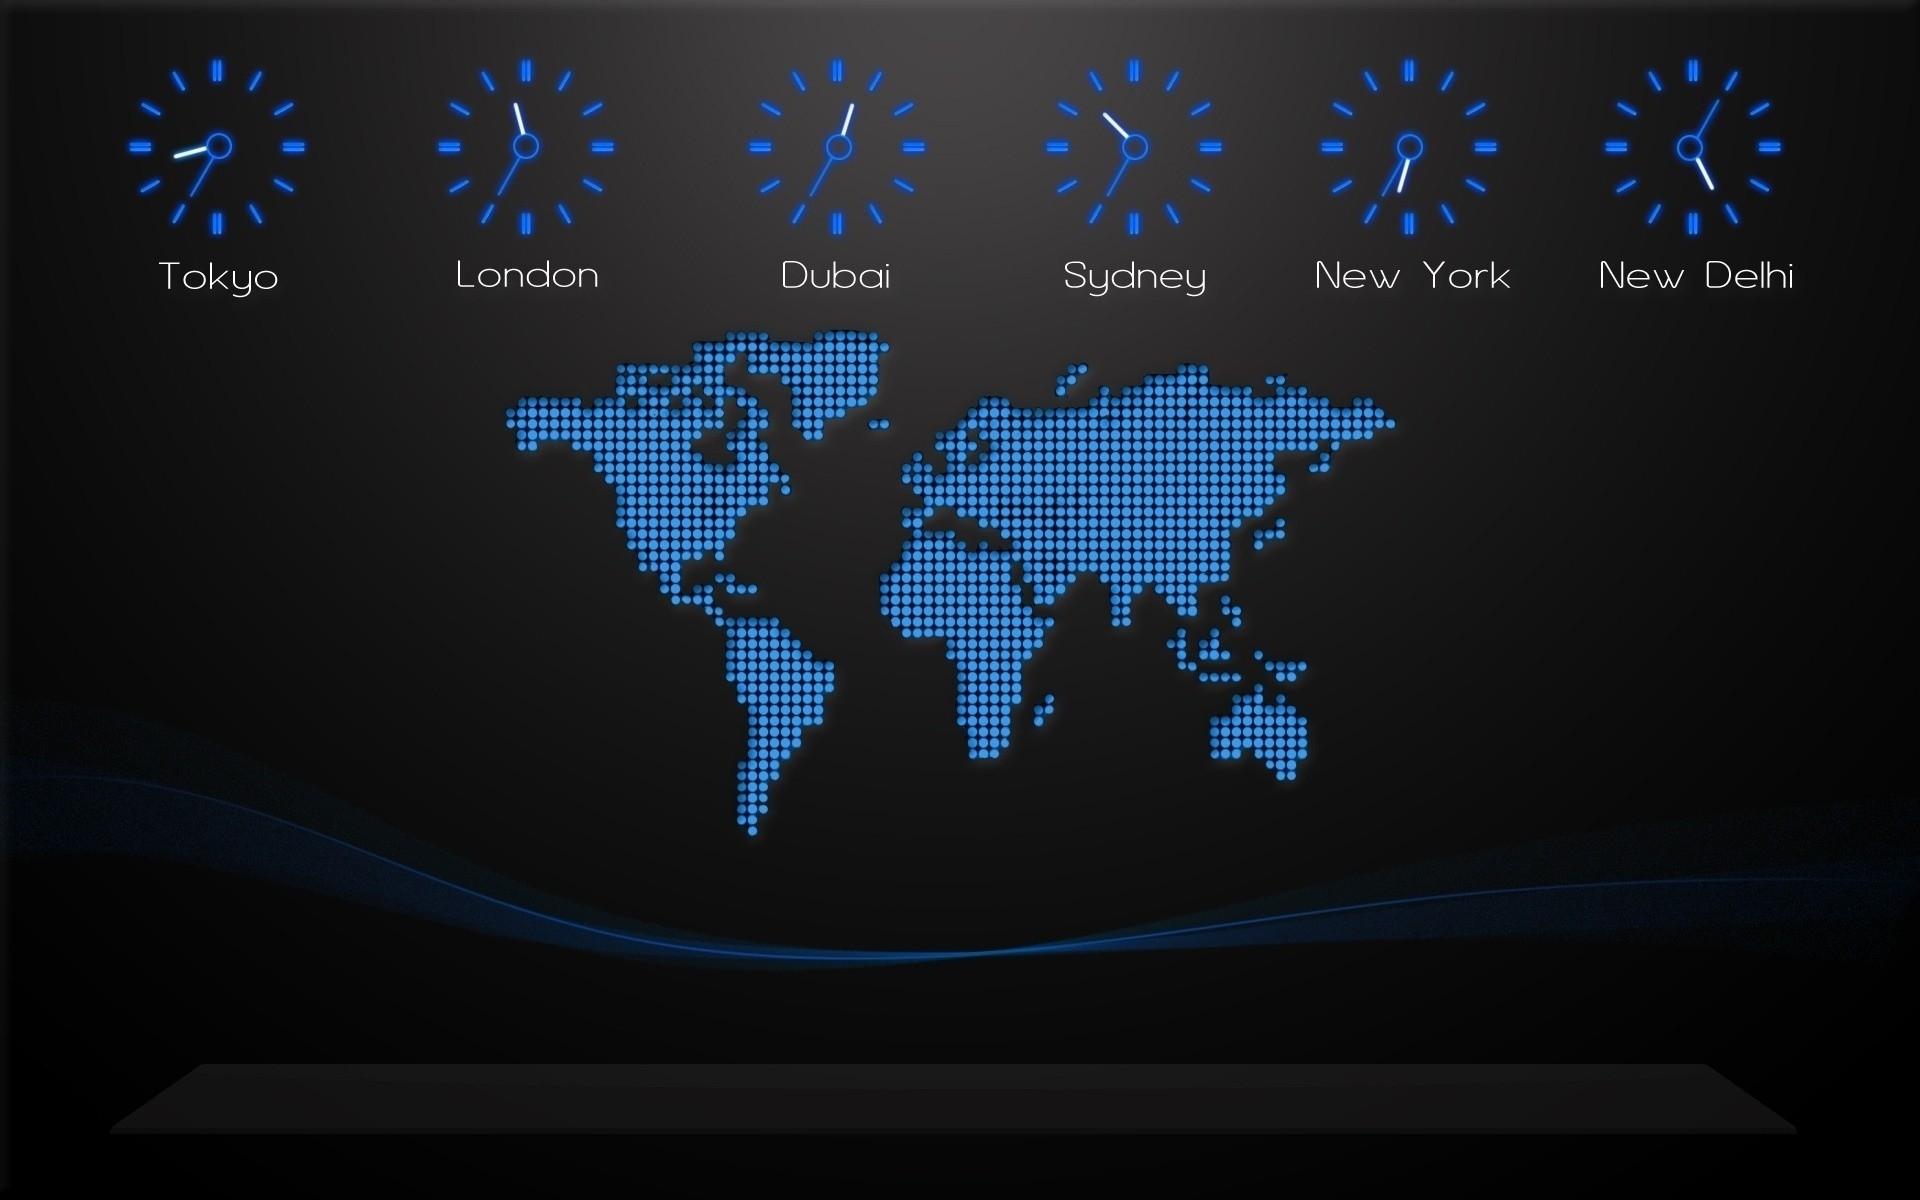 World map screensaver wallpaper 56 images 1920x1200 wallpaper textures simple map time world clocks desktop wallpaper gumiabroncs Image collections